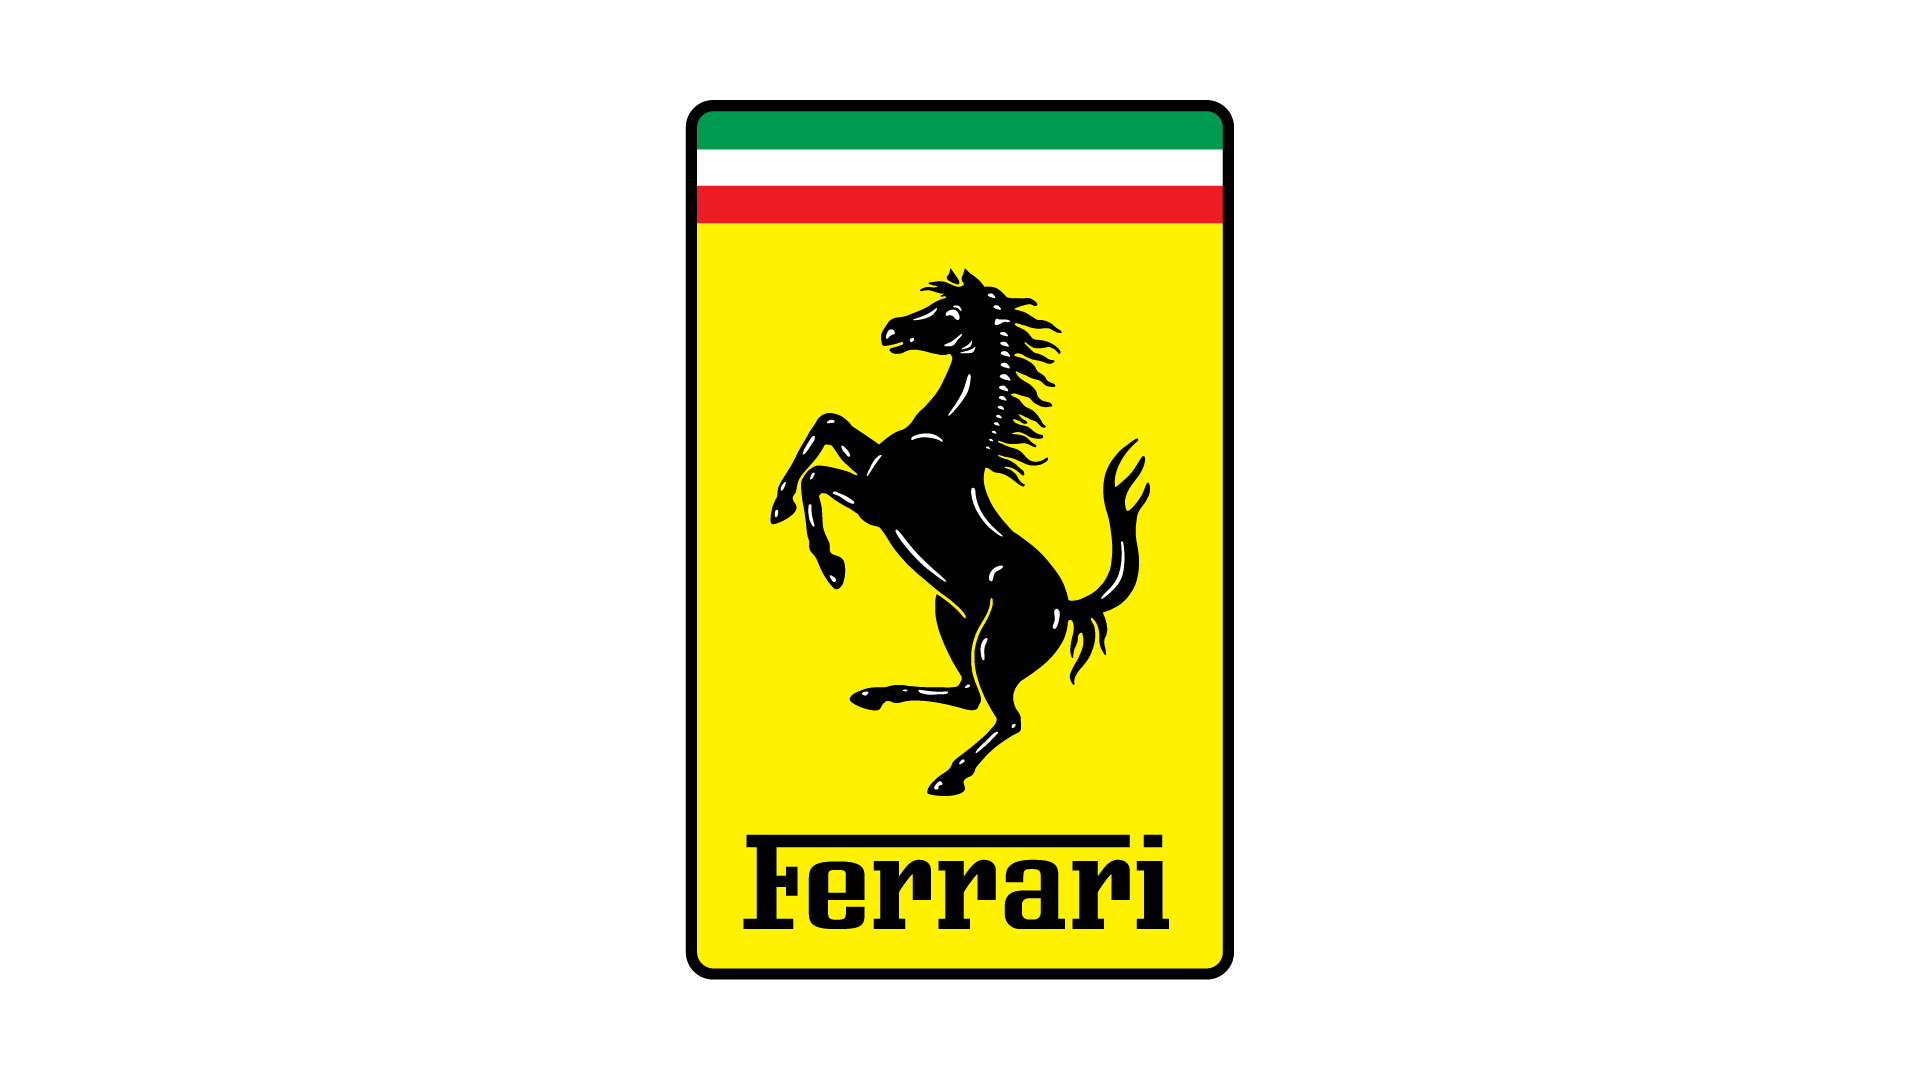 Ferrari nyserace celebrates initial public offering on the nyse biocorpaavc